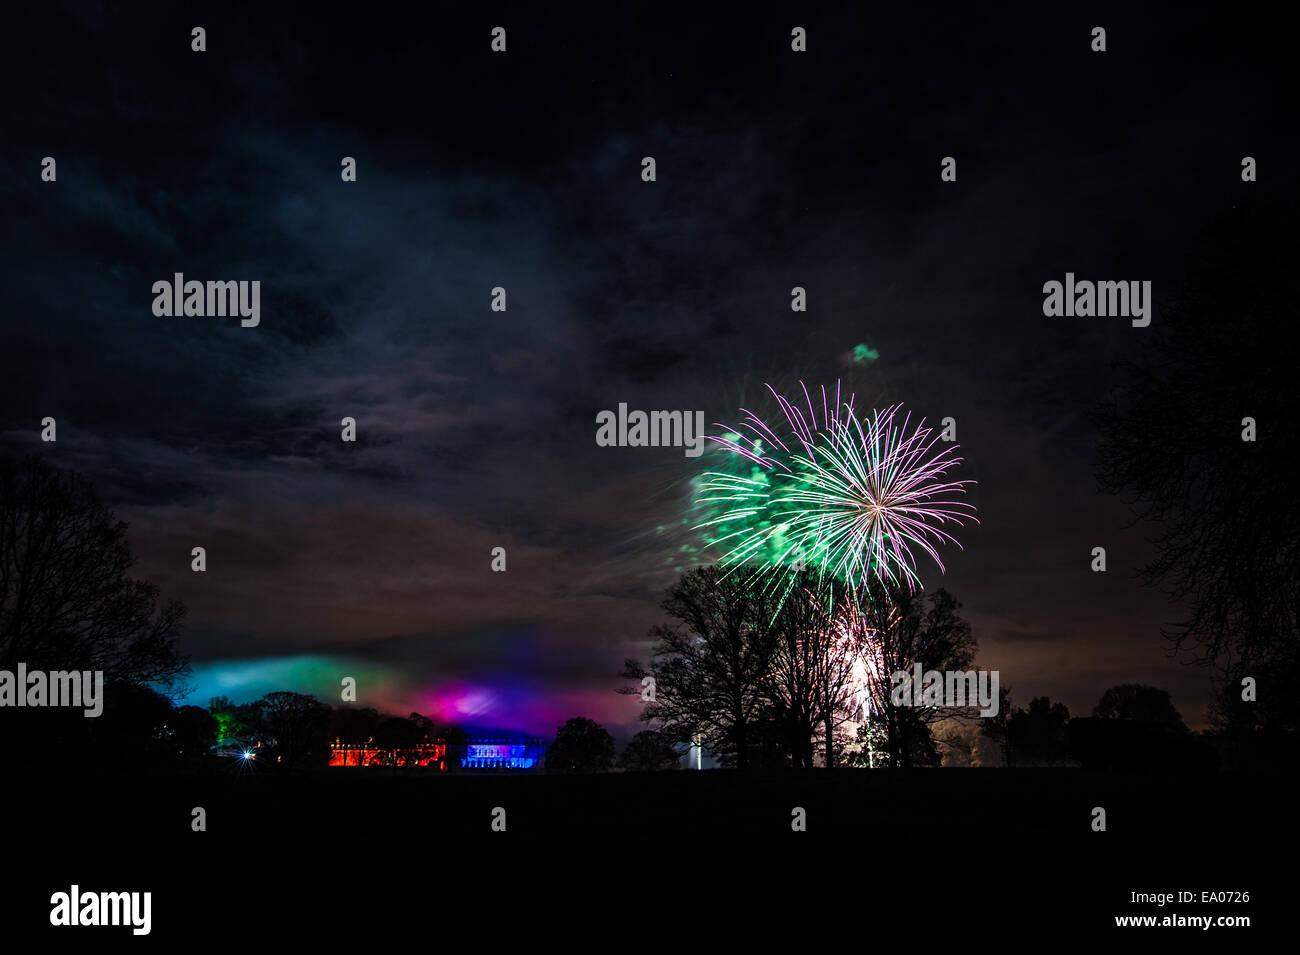 Firework display at Boughton House, Kettering - Stock Image